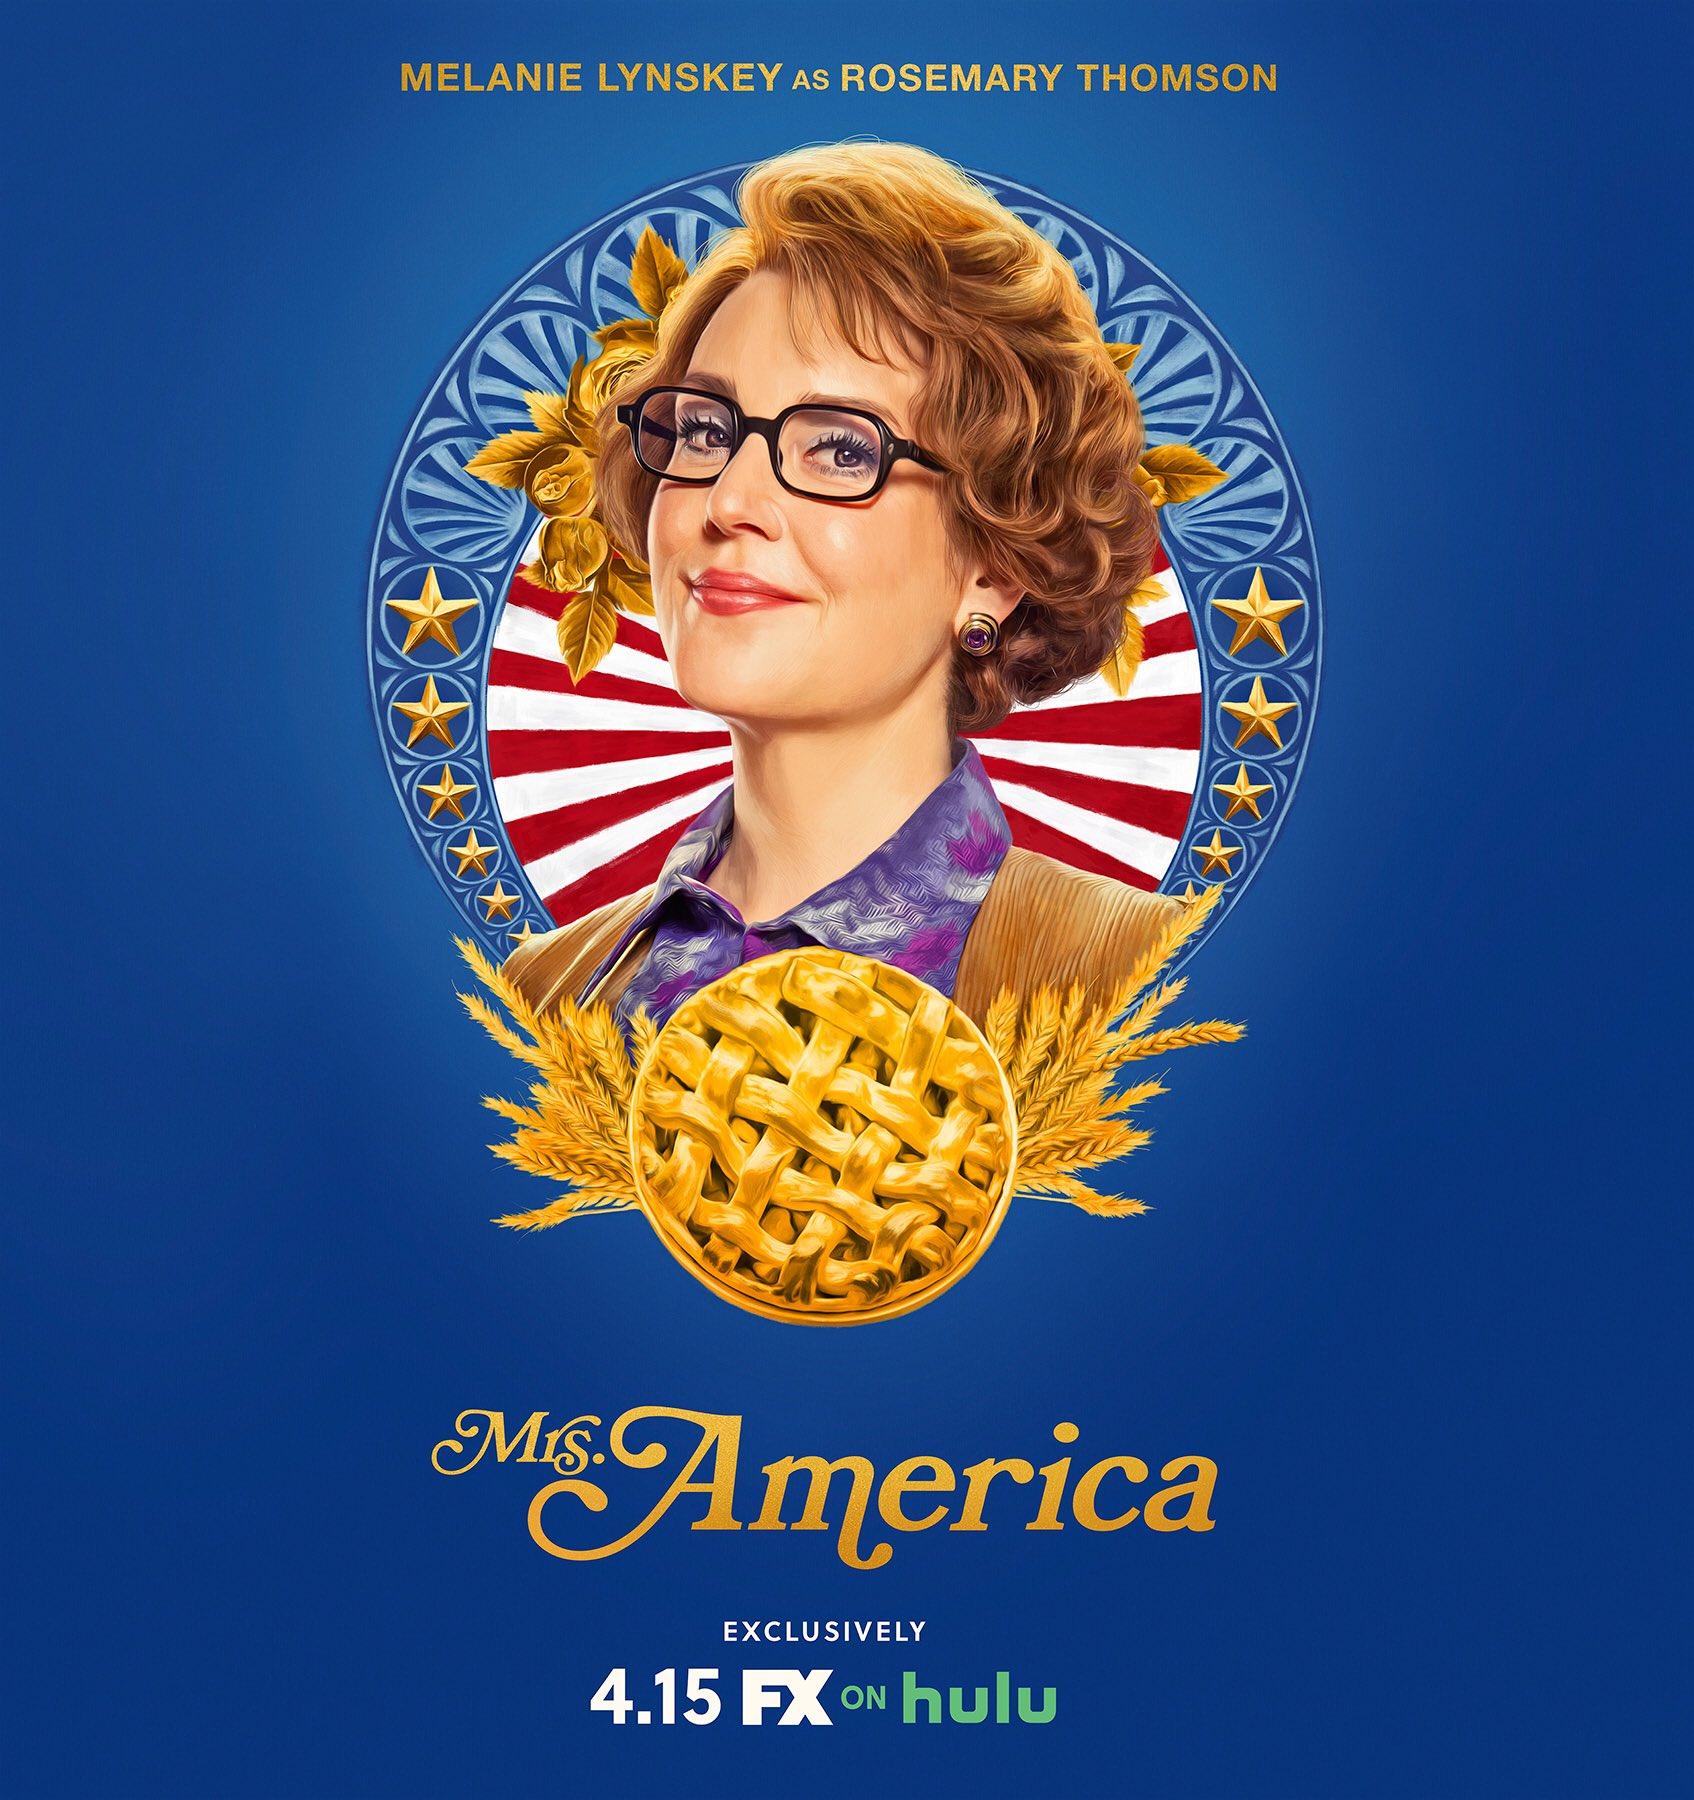 Mrs. America - Season 1 Poster - Melanie Lynskey as Rosemary Thomson